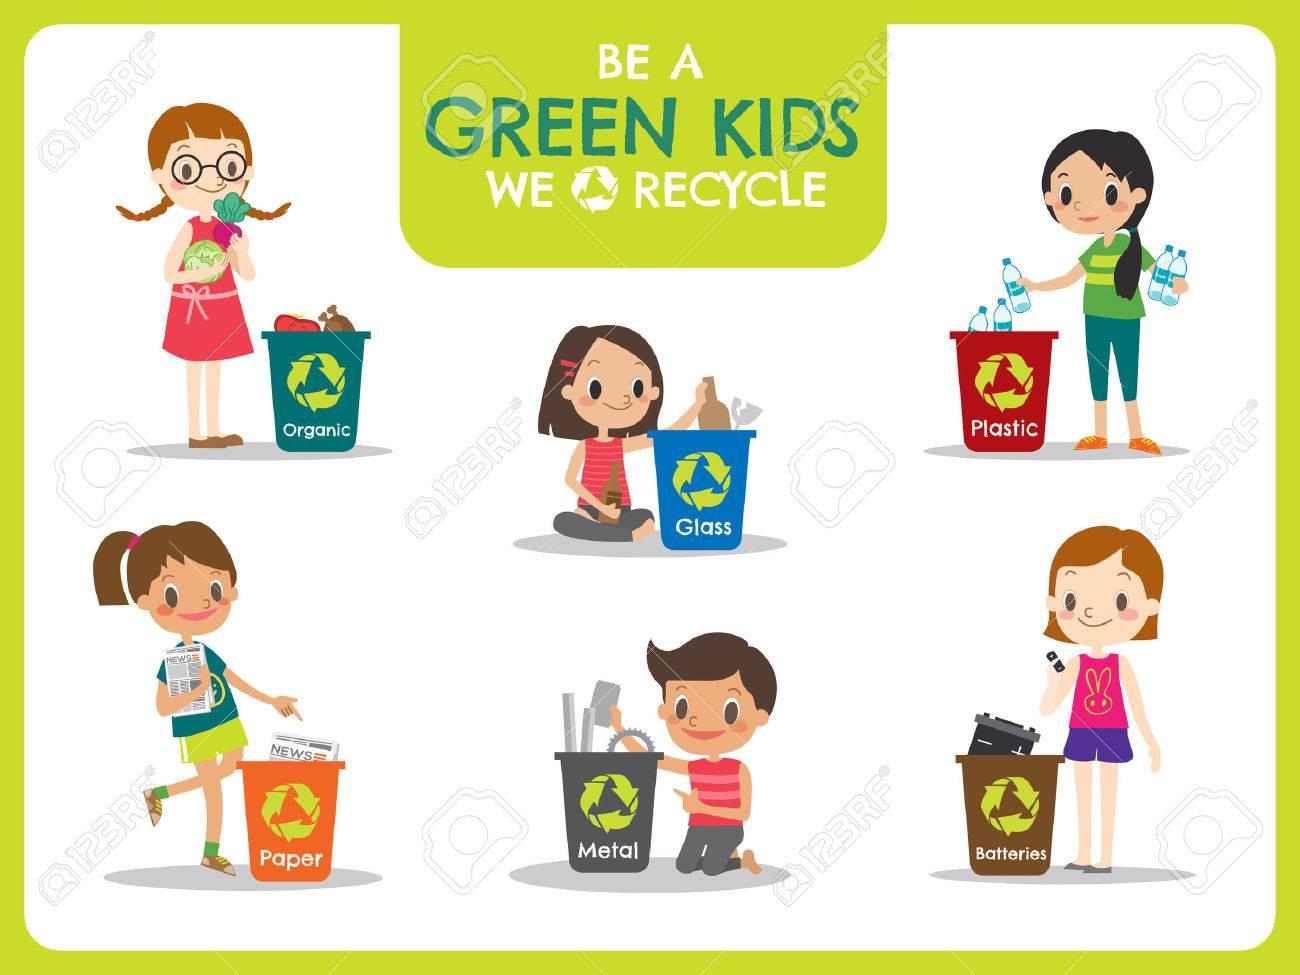 Green kids segregating trash recycling concept illustration - 56887932